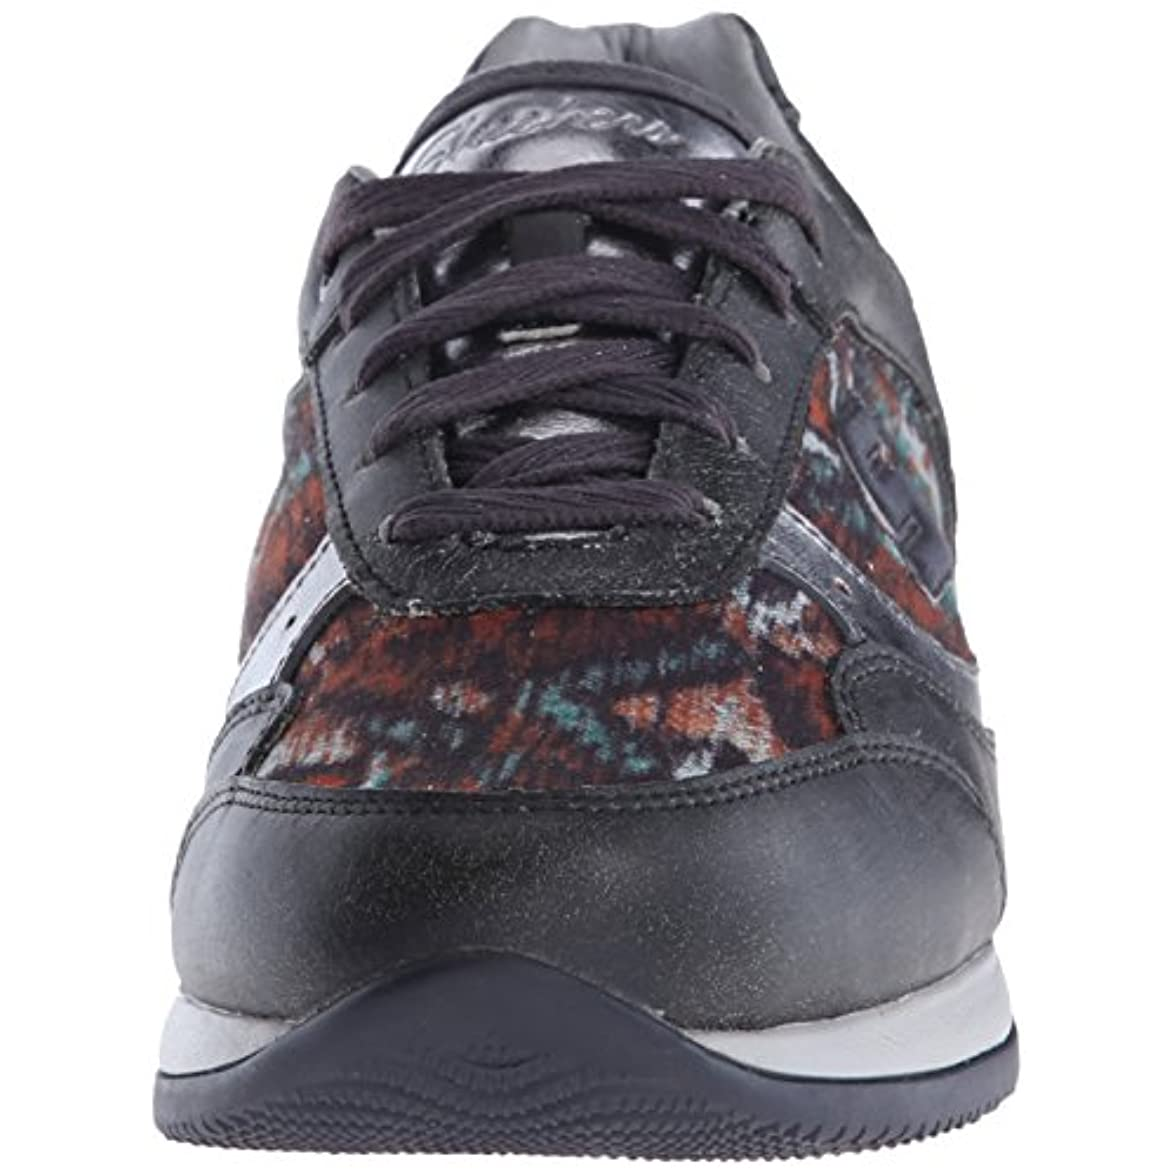 Donna Vivere Fashion Sneaker Black 6 M Us